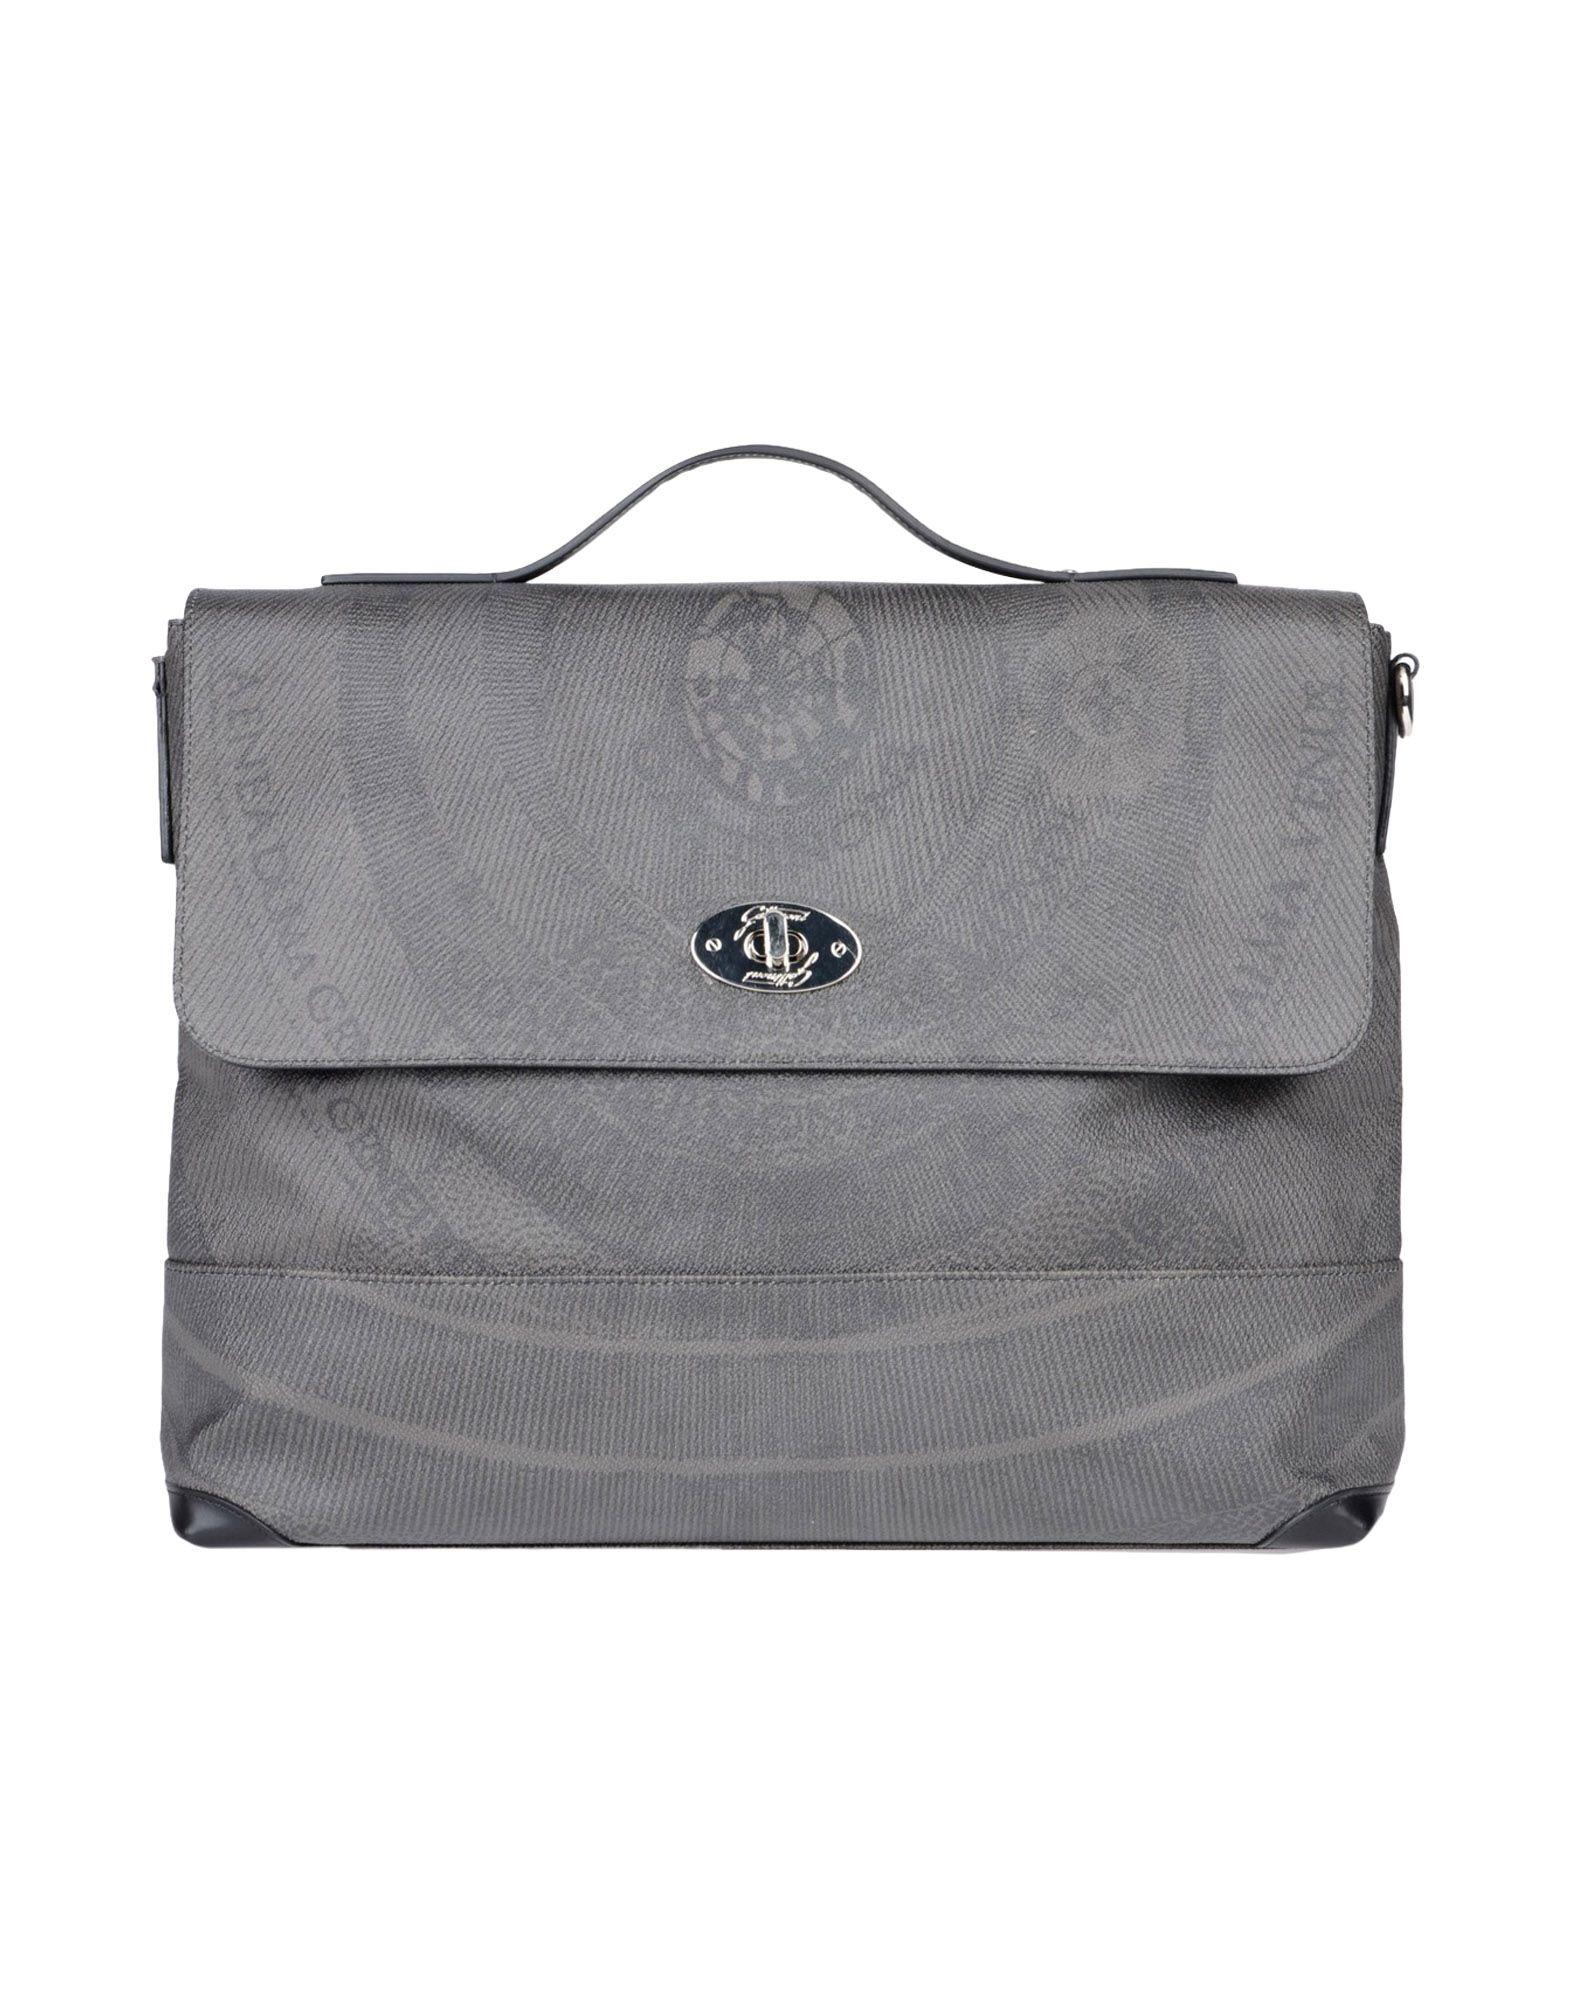 GATTINONI Деловые сумки